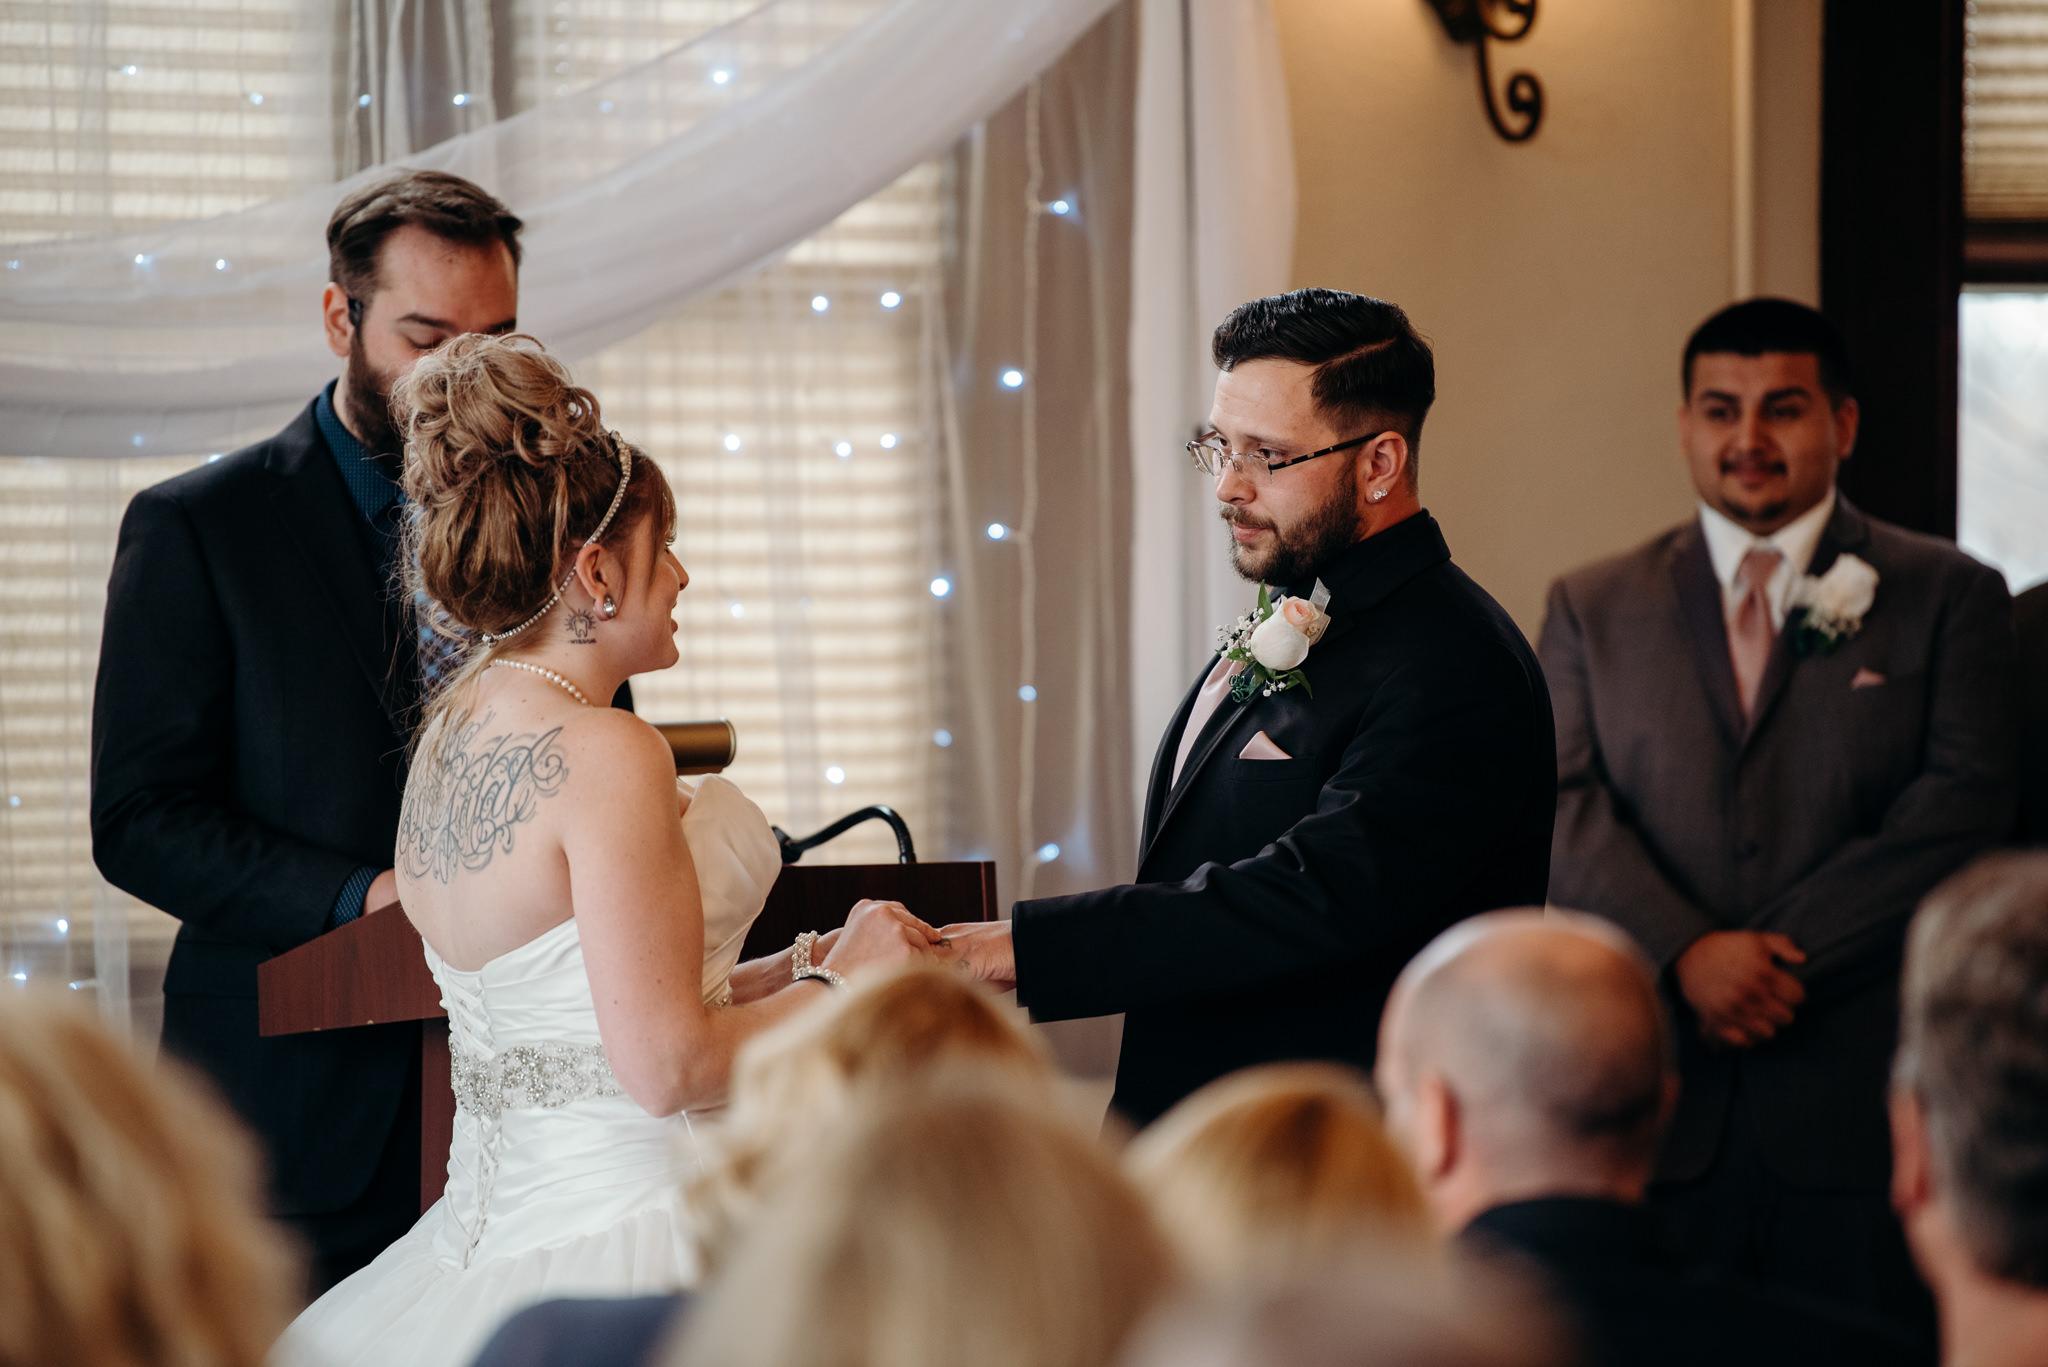 Grant Beachy Photo portrait wedding goshen elkhart south bend chicago-026.jpg